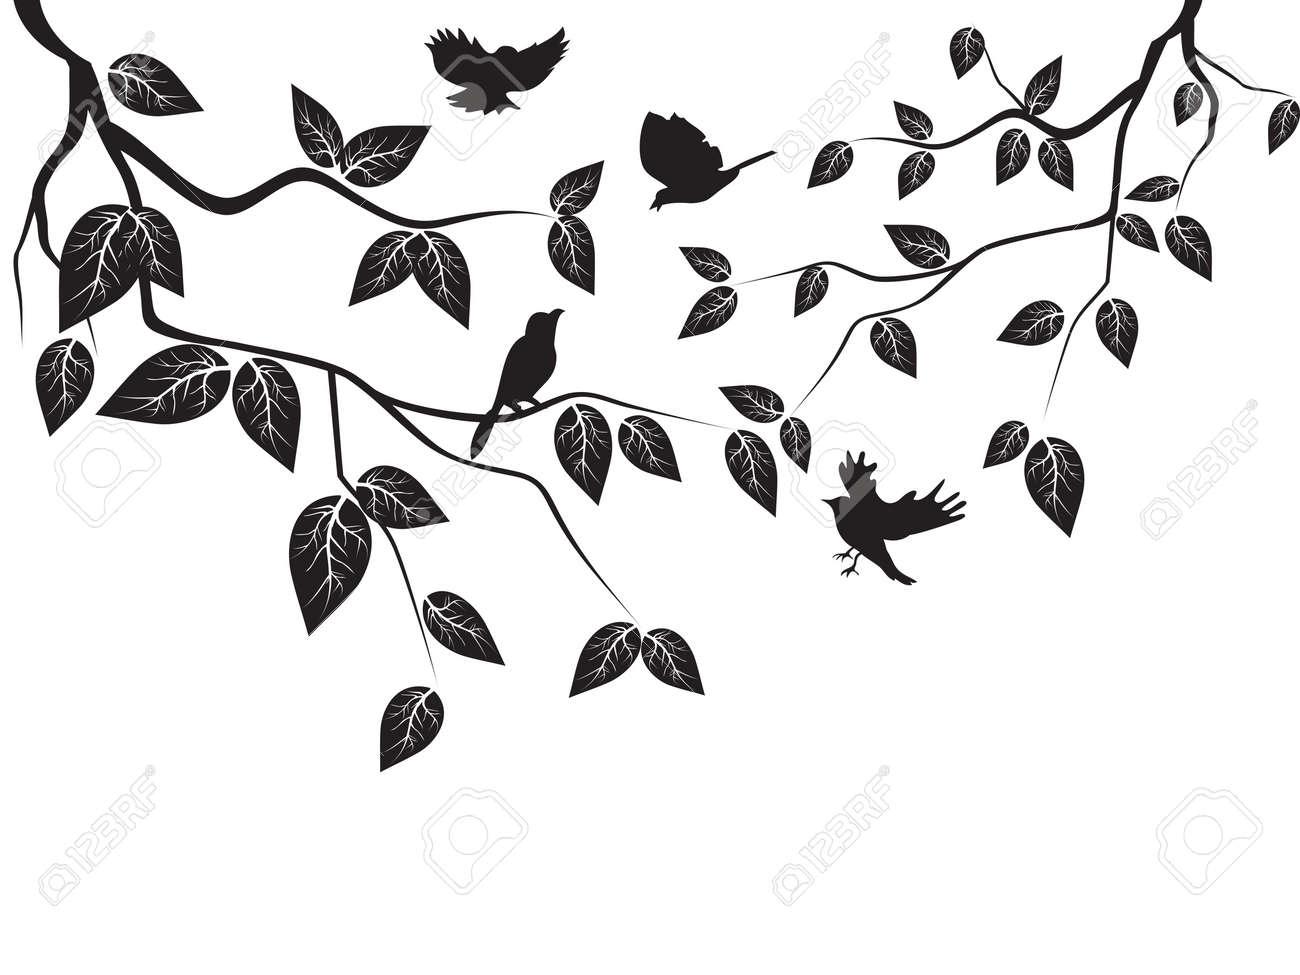 Flying Birds Silhouette Tree Birds Flying in The Tree